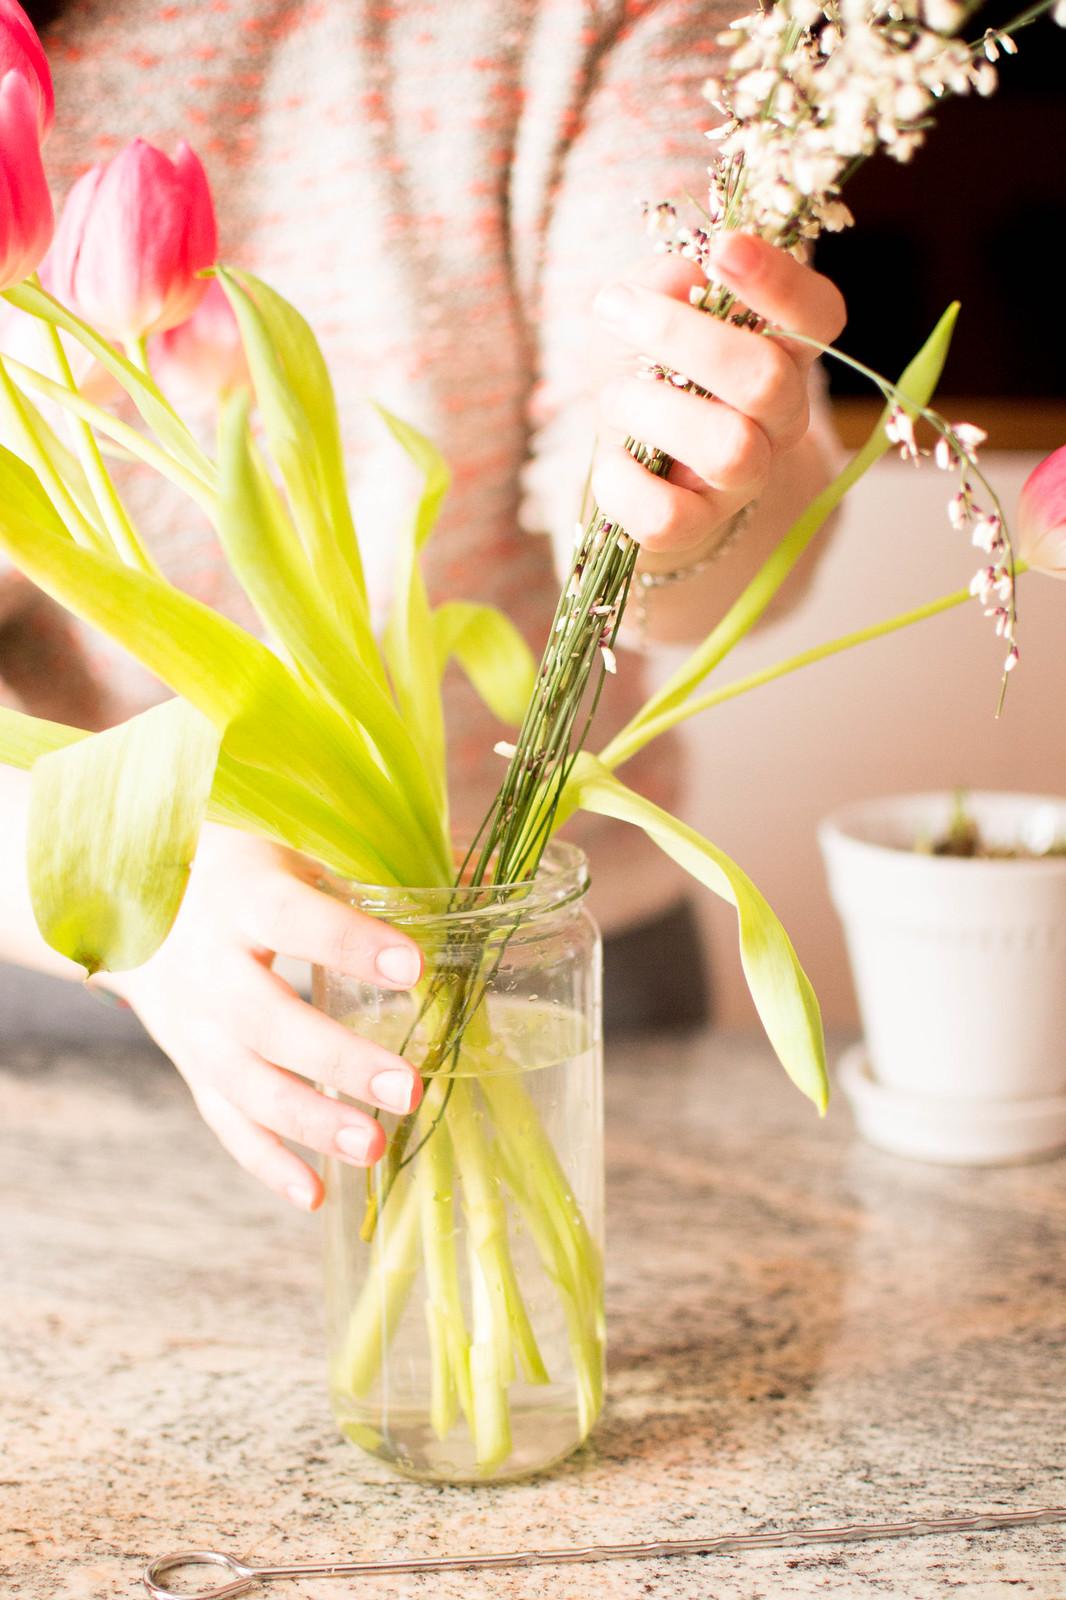 How to grow an indoor green thumb